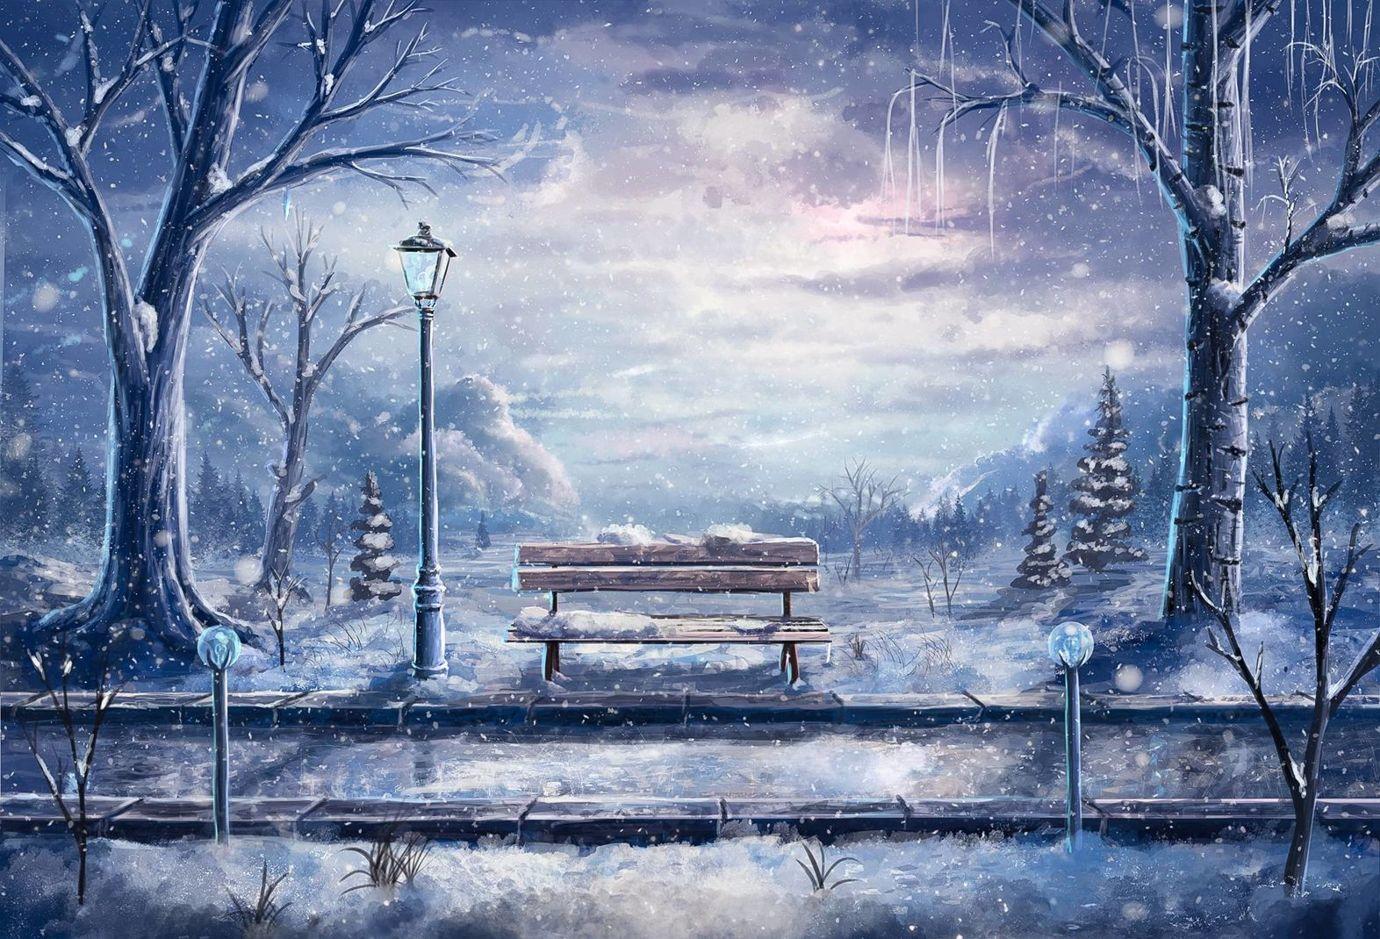 Scenery anime winter background